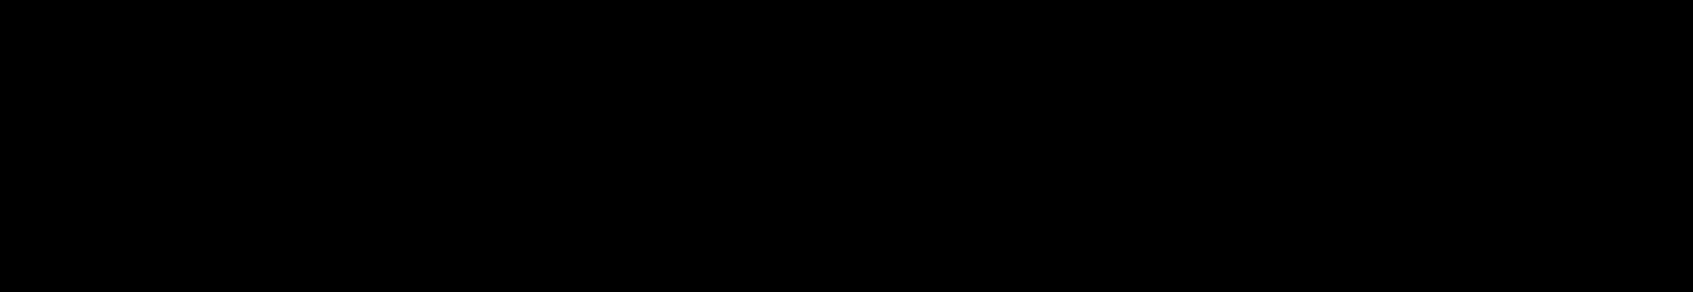 圖片1-beijing